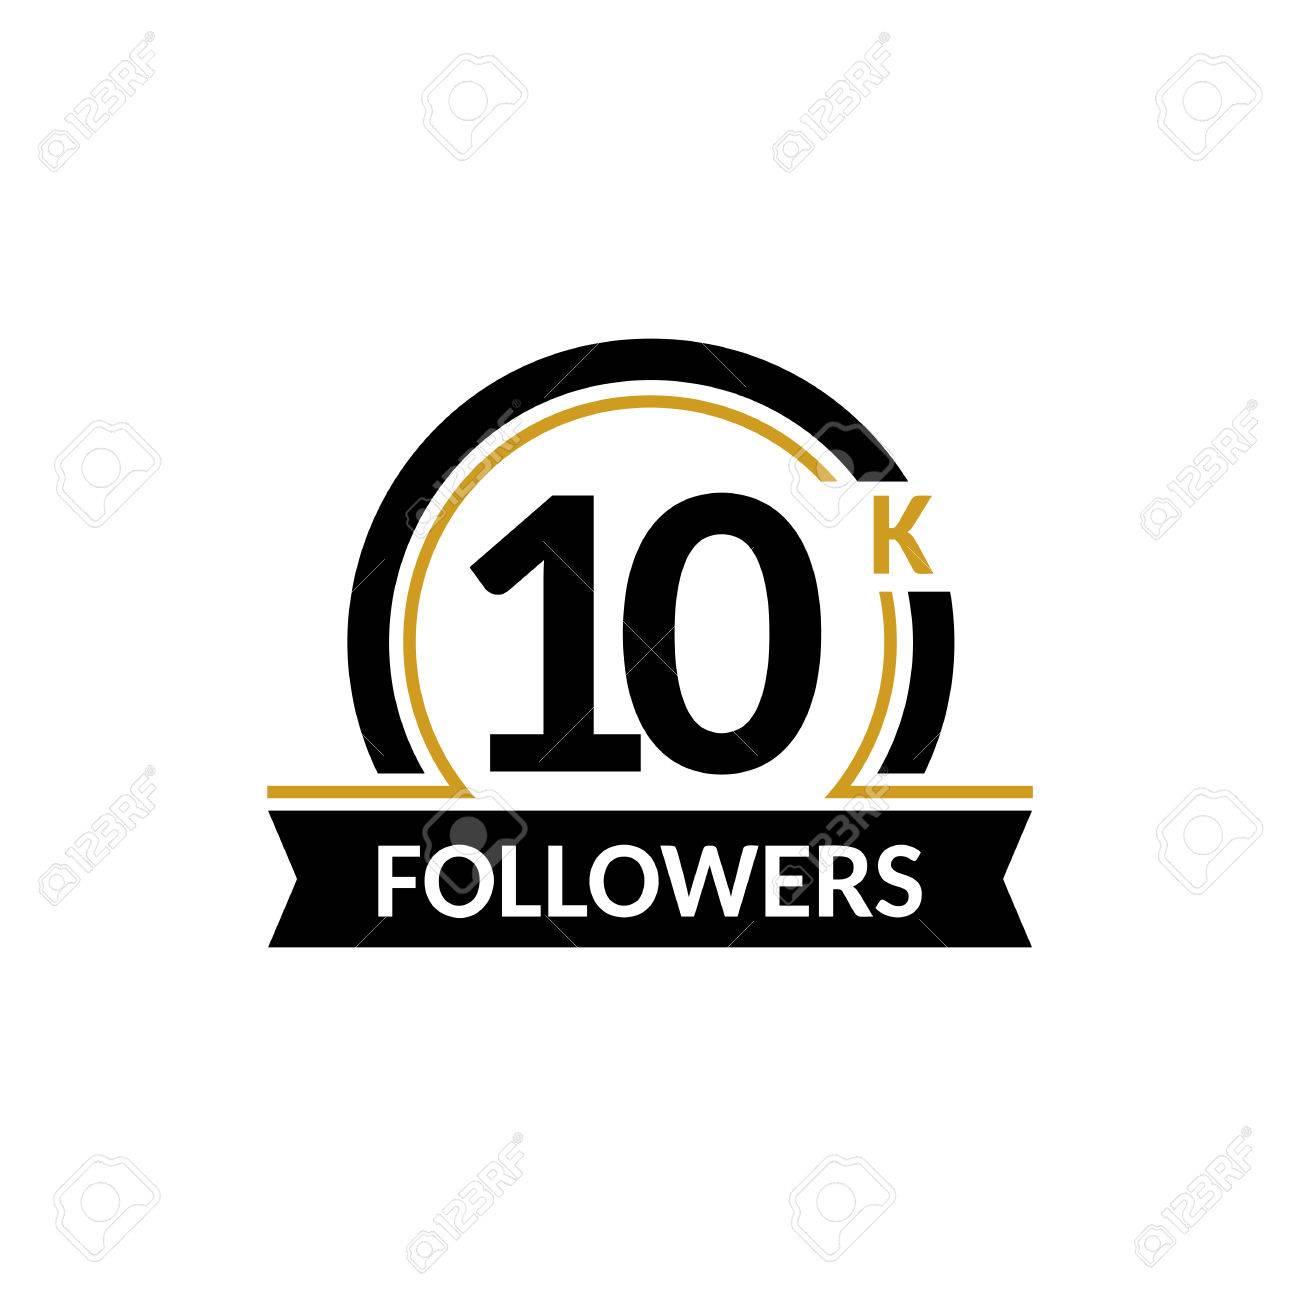 10000 followers and friends 10k anniversary congratulations